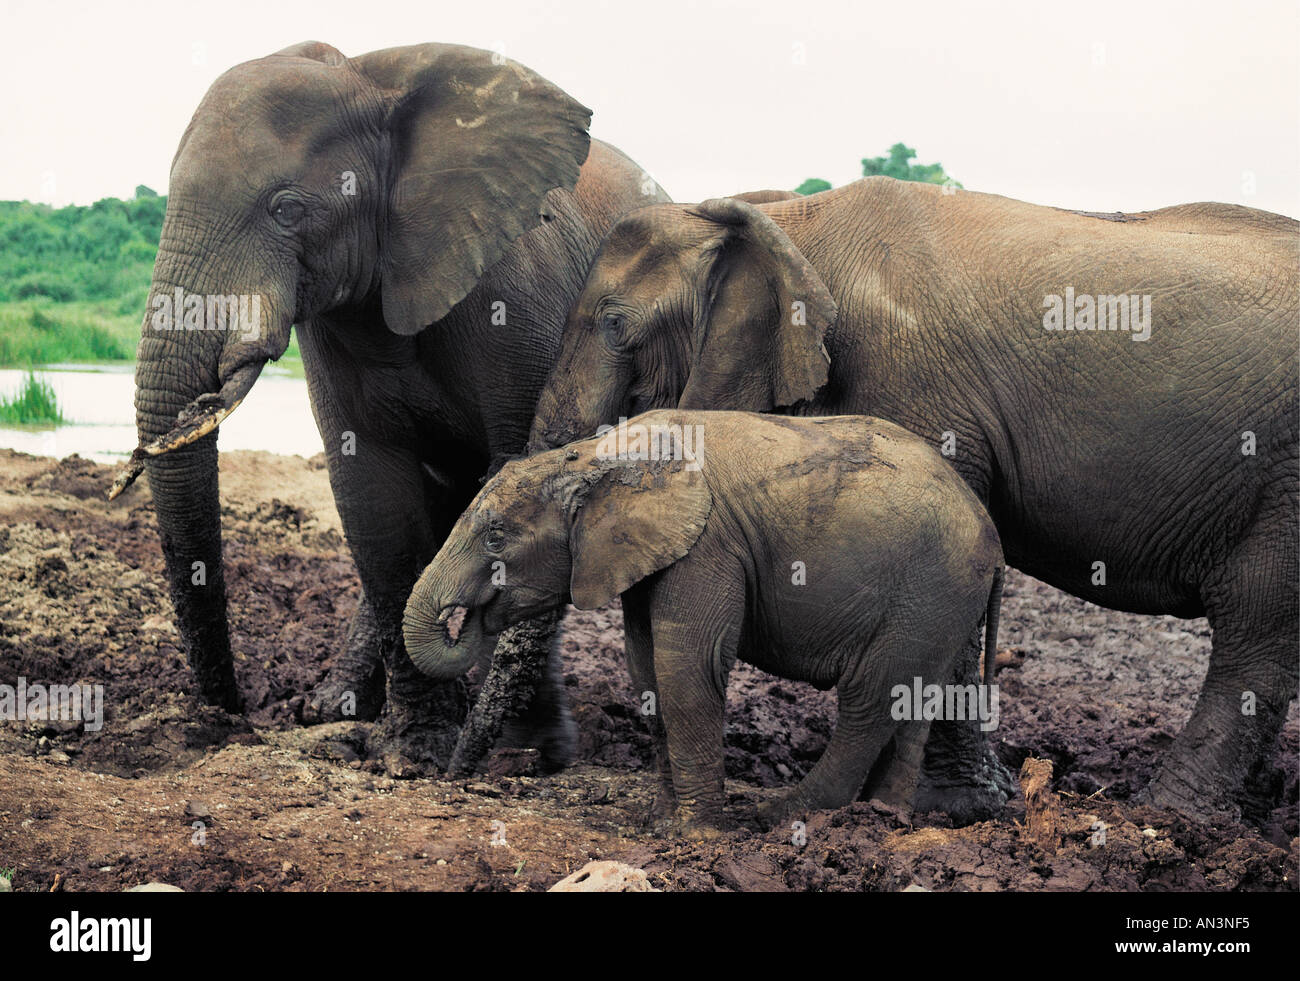 Femmina d'elefante e vitello all'arca Salt Lick Aberdares Parco Nazionale del Kenya Immagini Stock